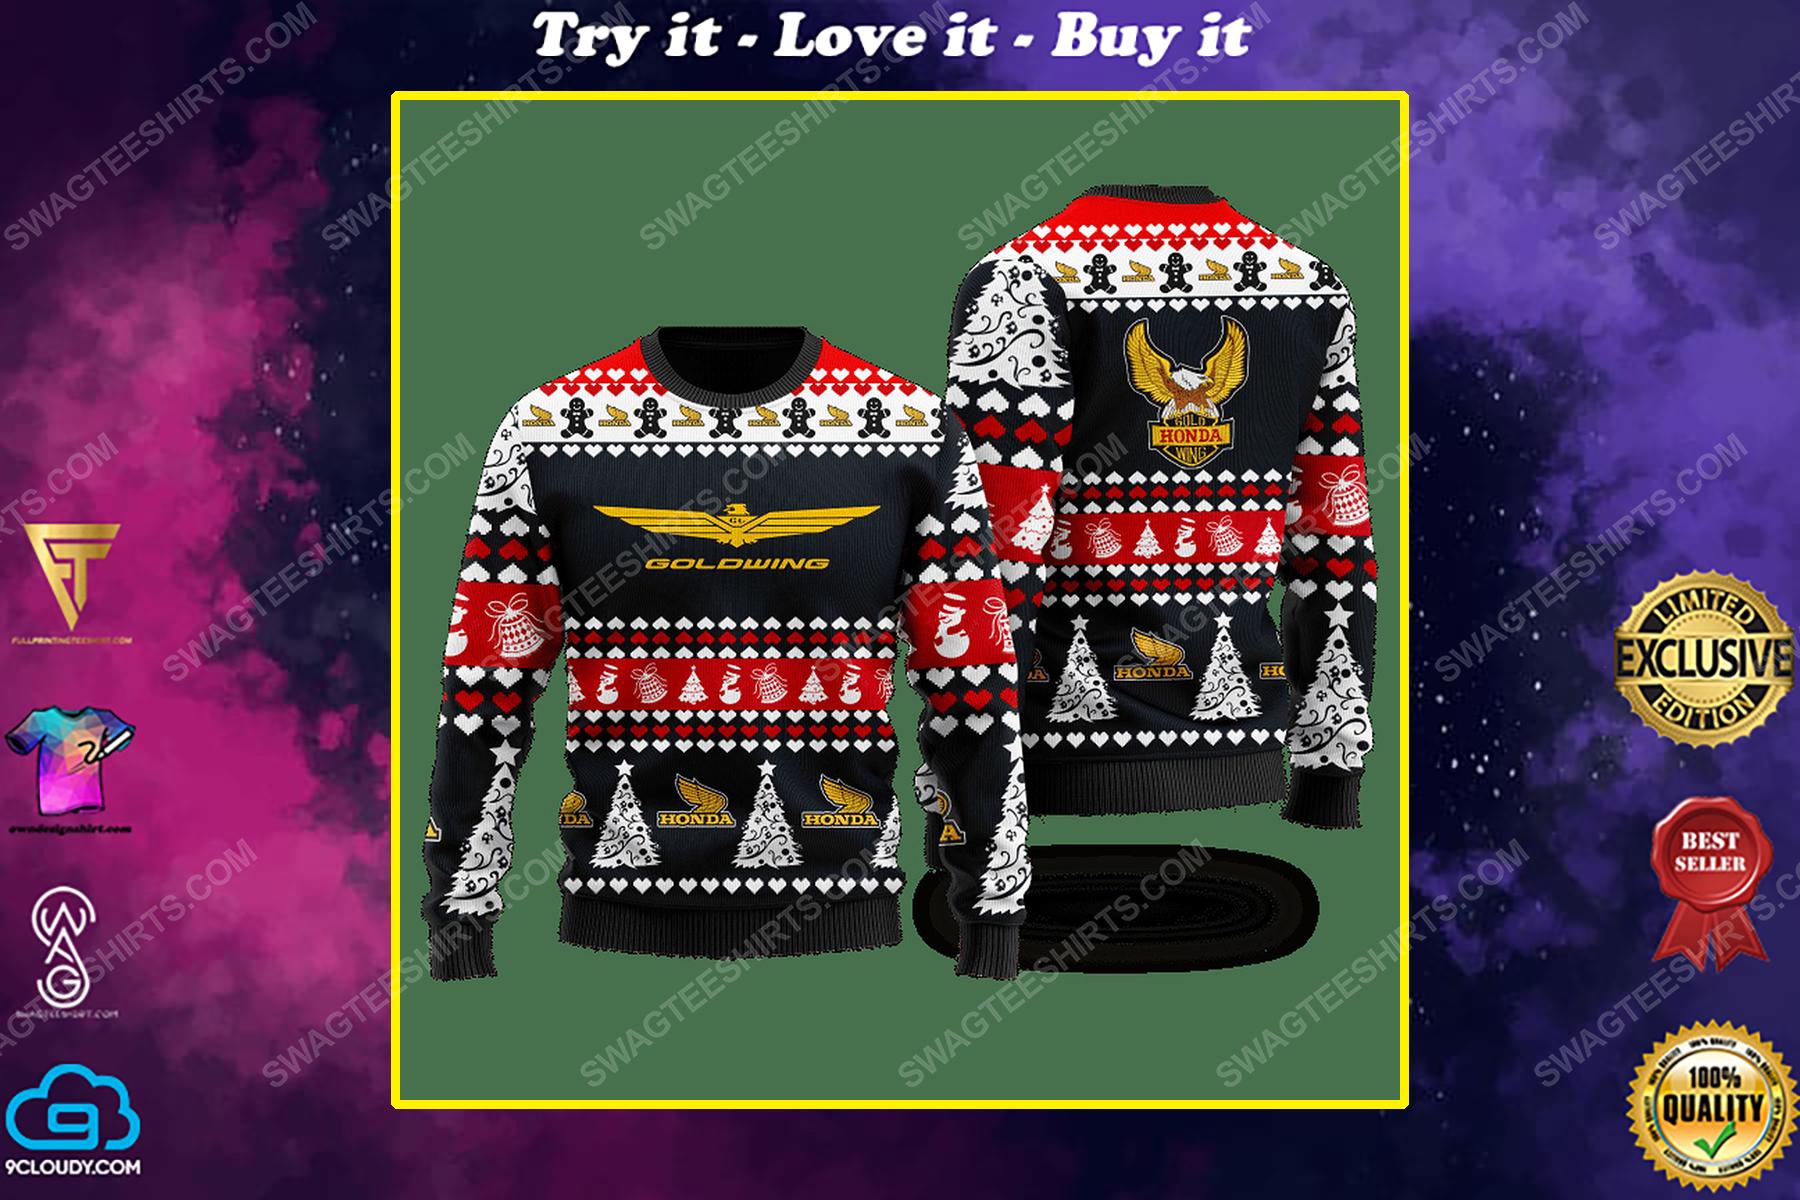 Honda gold wing racing ugly christmas sweater 1